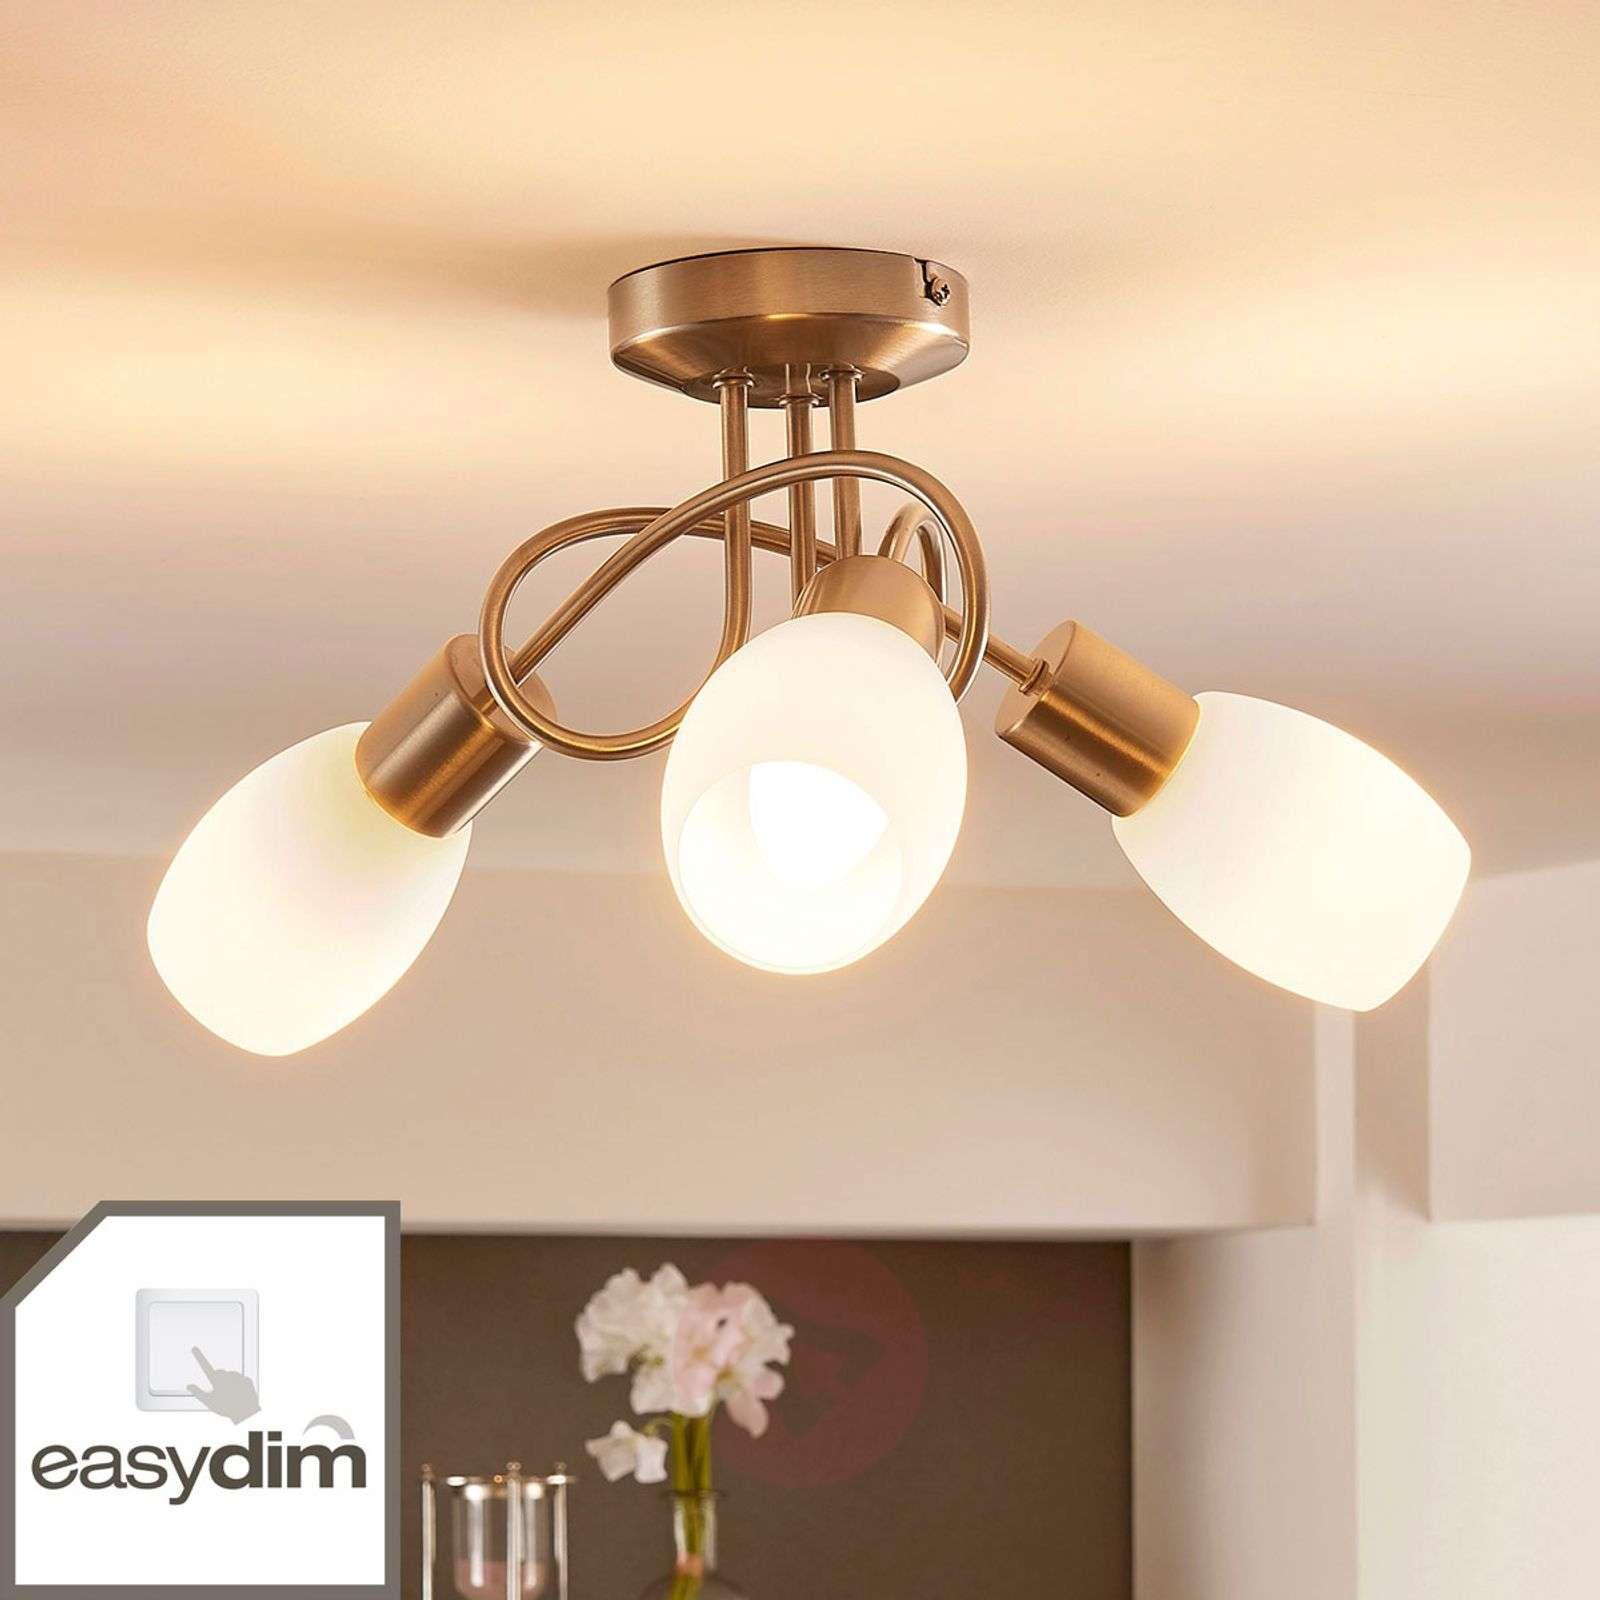 Attractive LED ceiling lamp Arda, Easydim-9621265-02